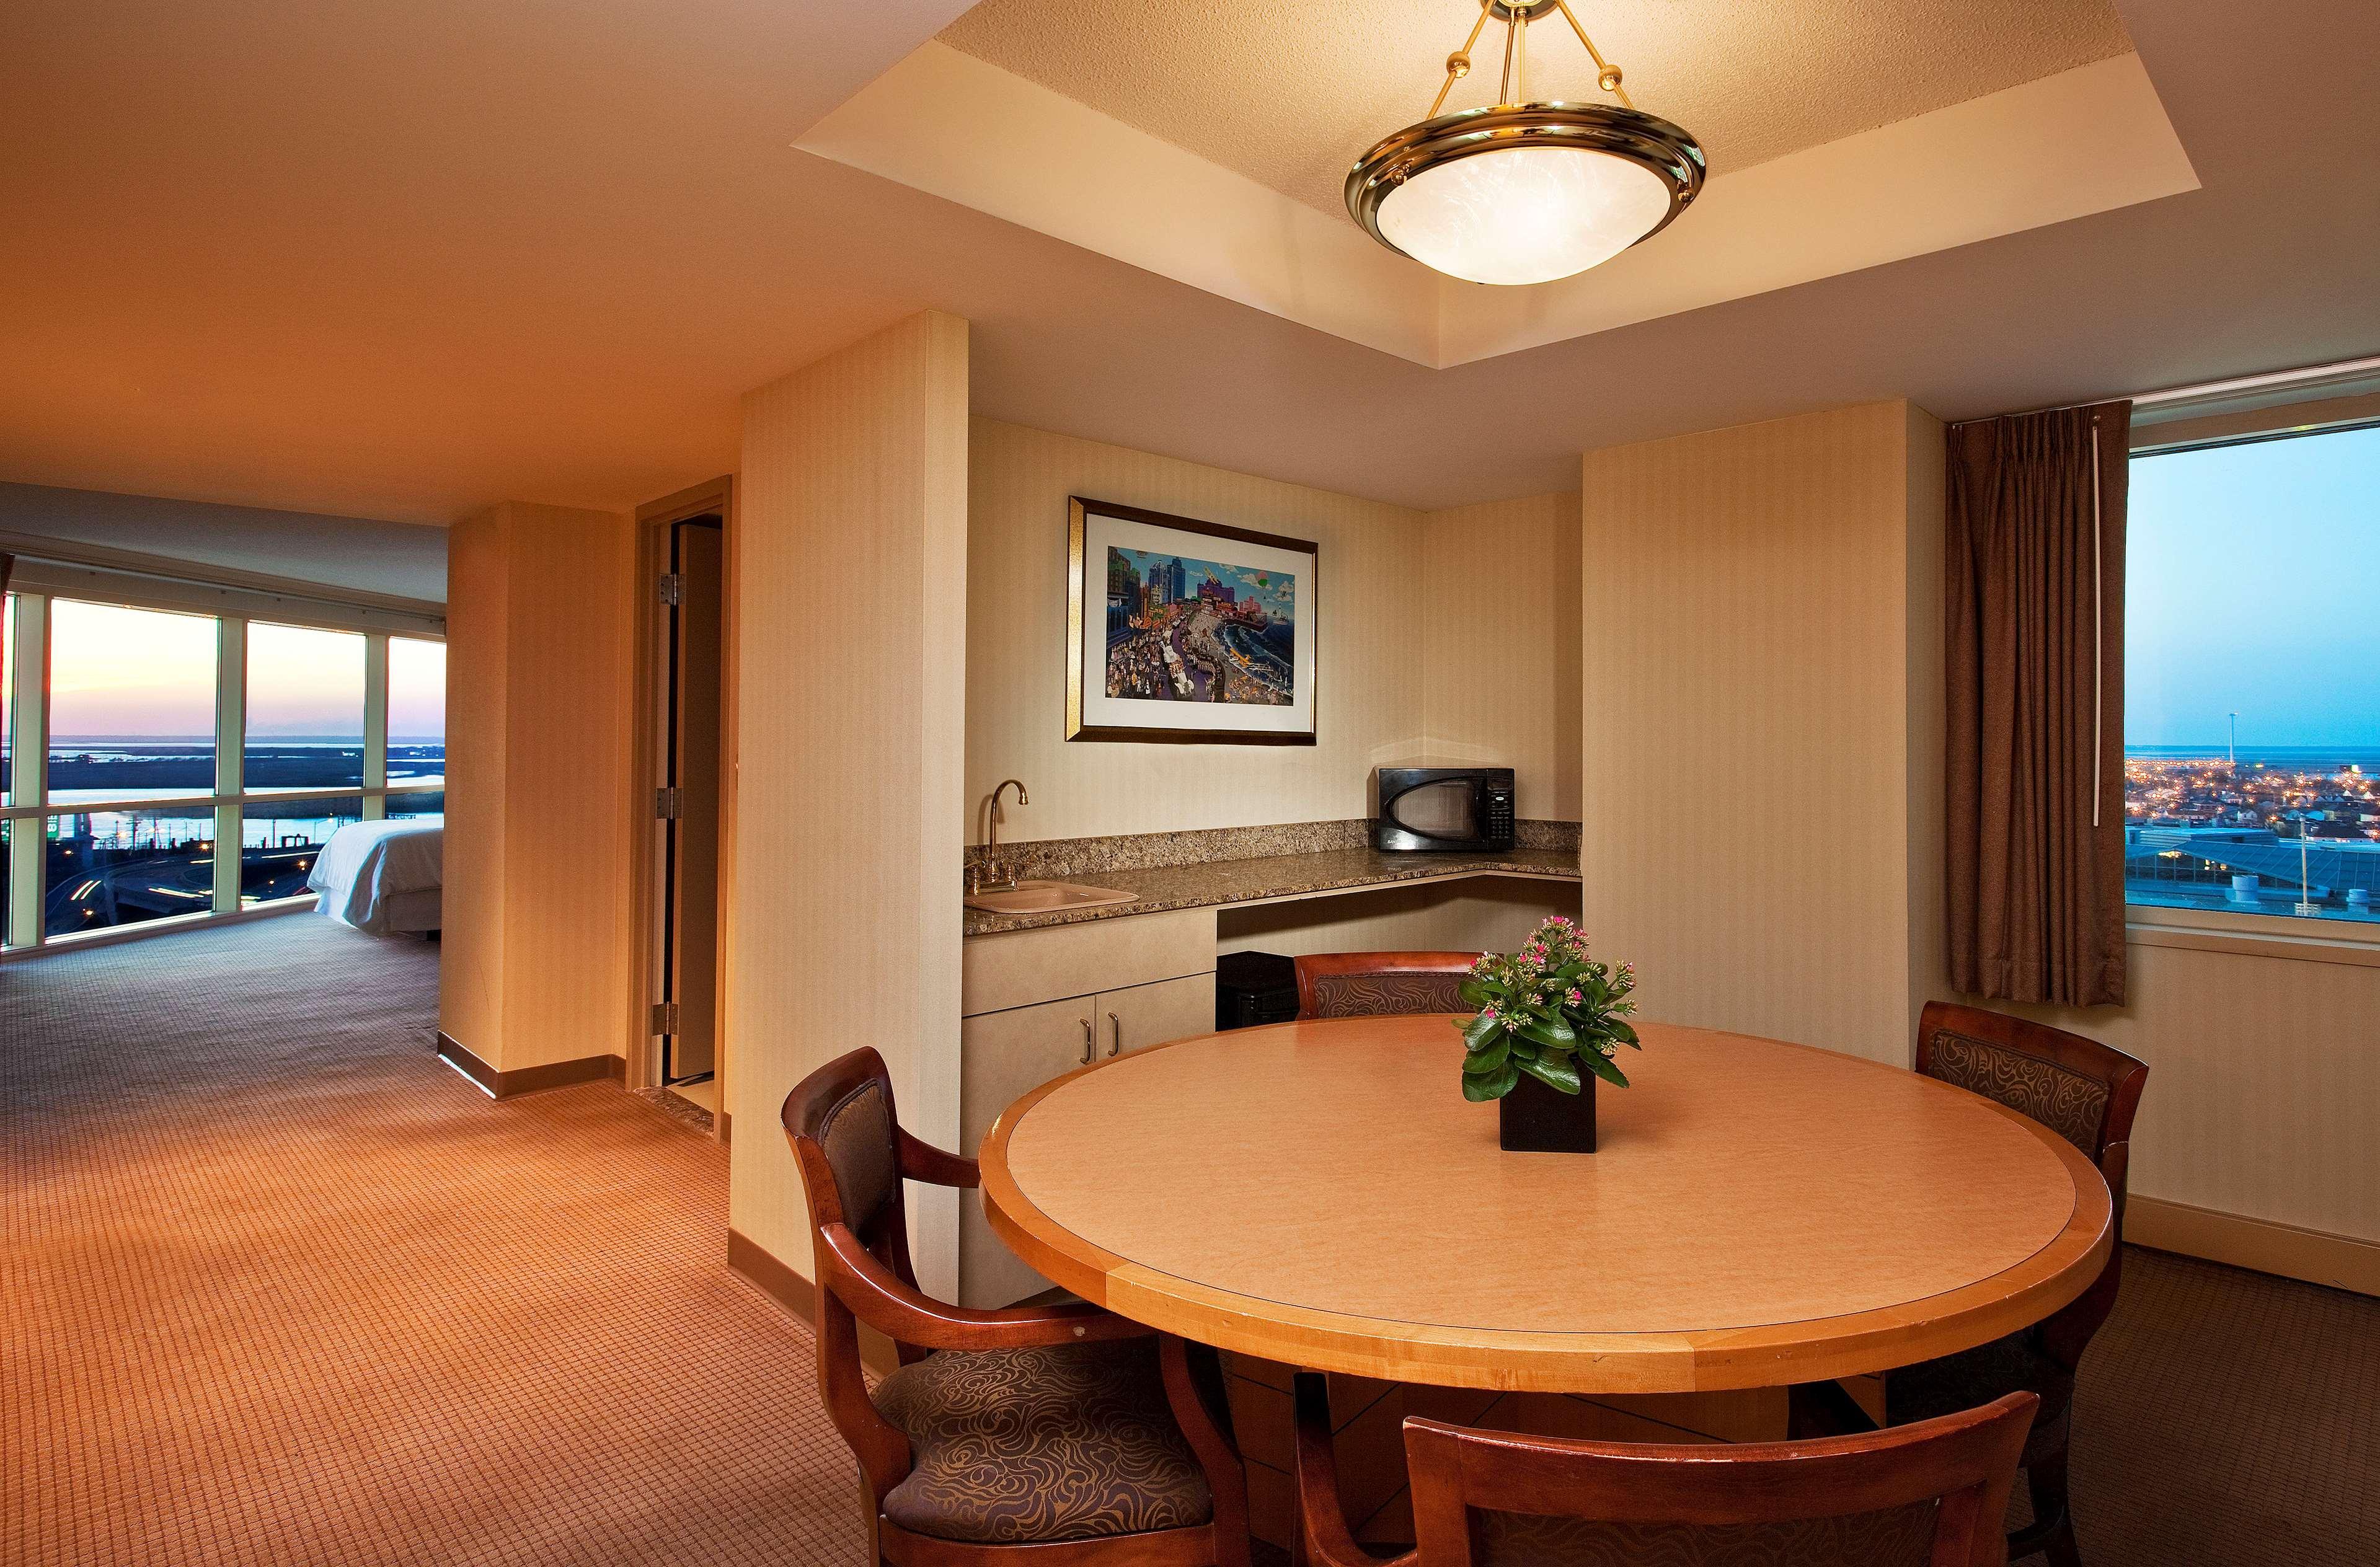 Sheraton Atlantic City Convention Center Hotel image 10